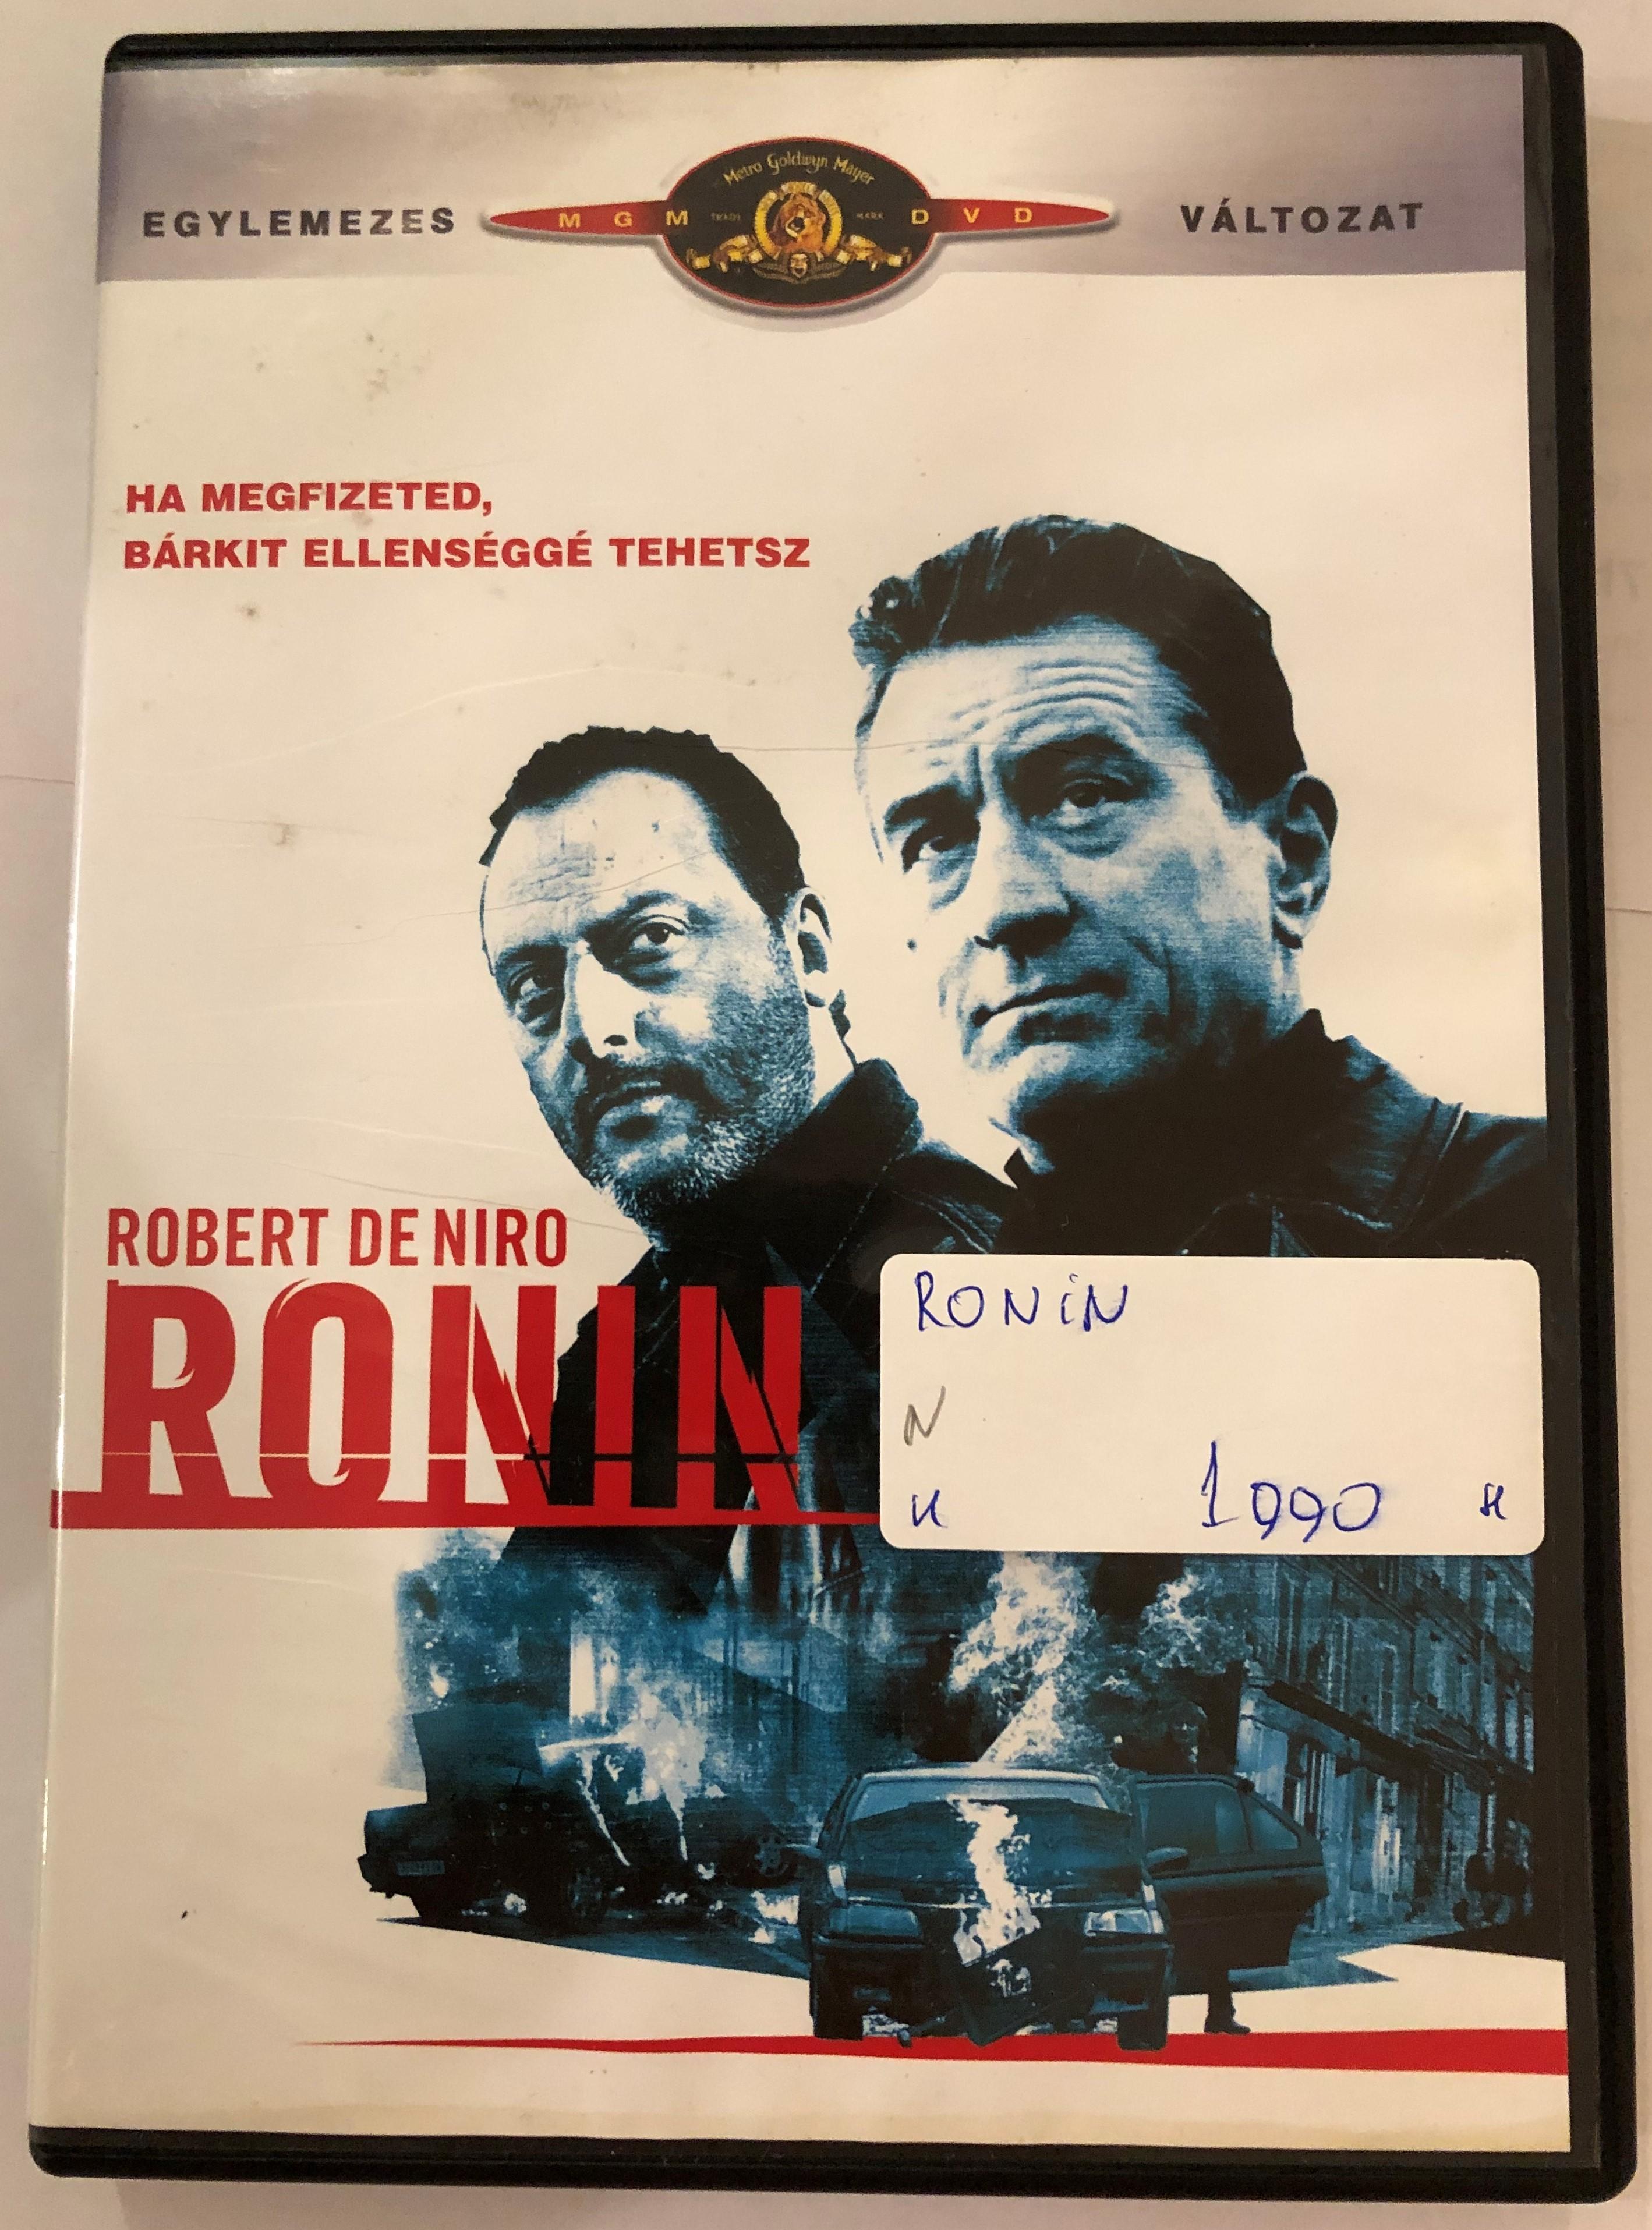 ronin-dvd-1998-directed-by-john-frankenheimer-starring-robert-de-niro-jean-reno-1-.jpg